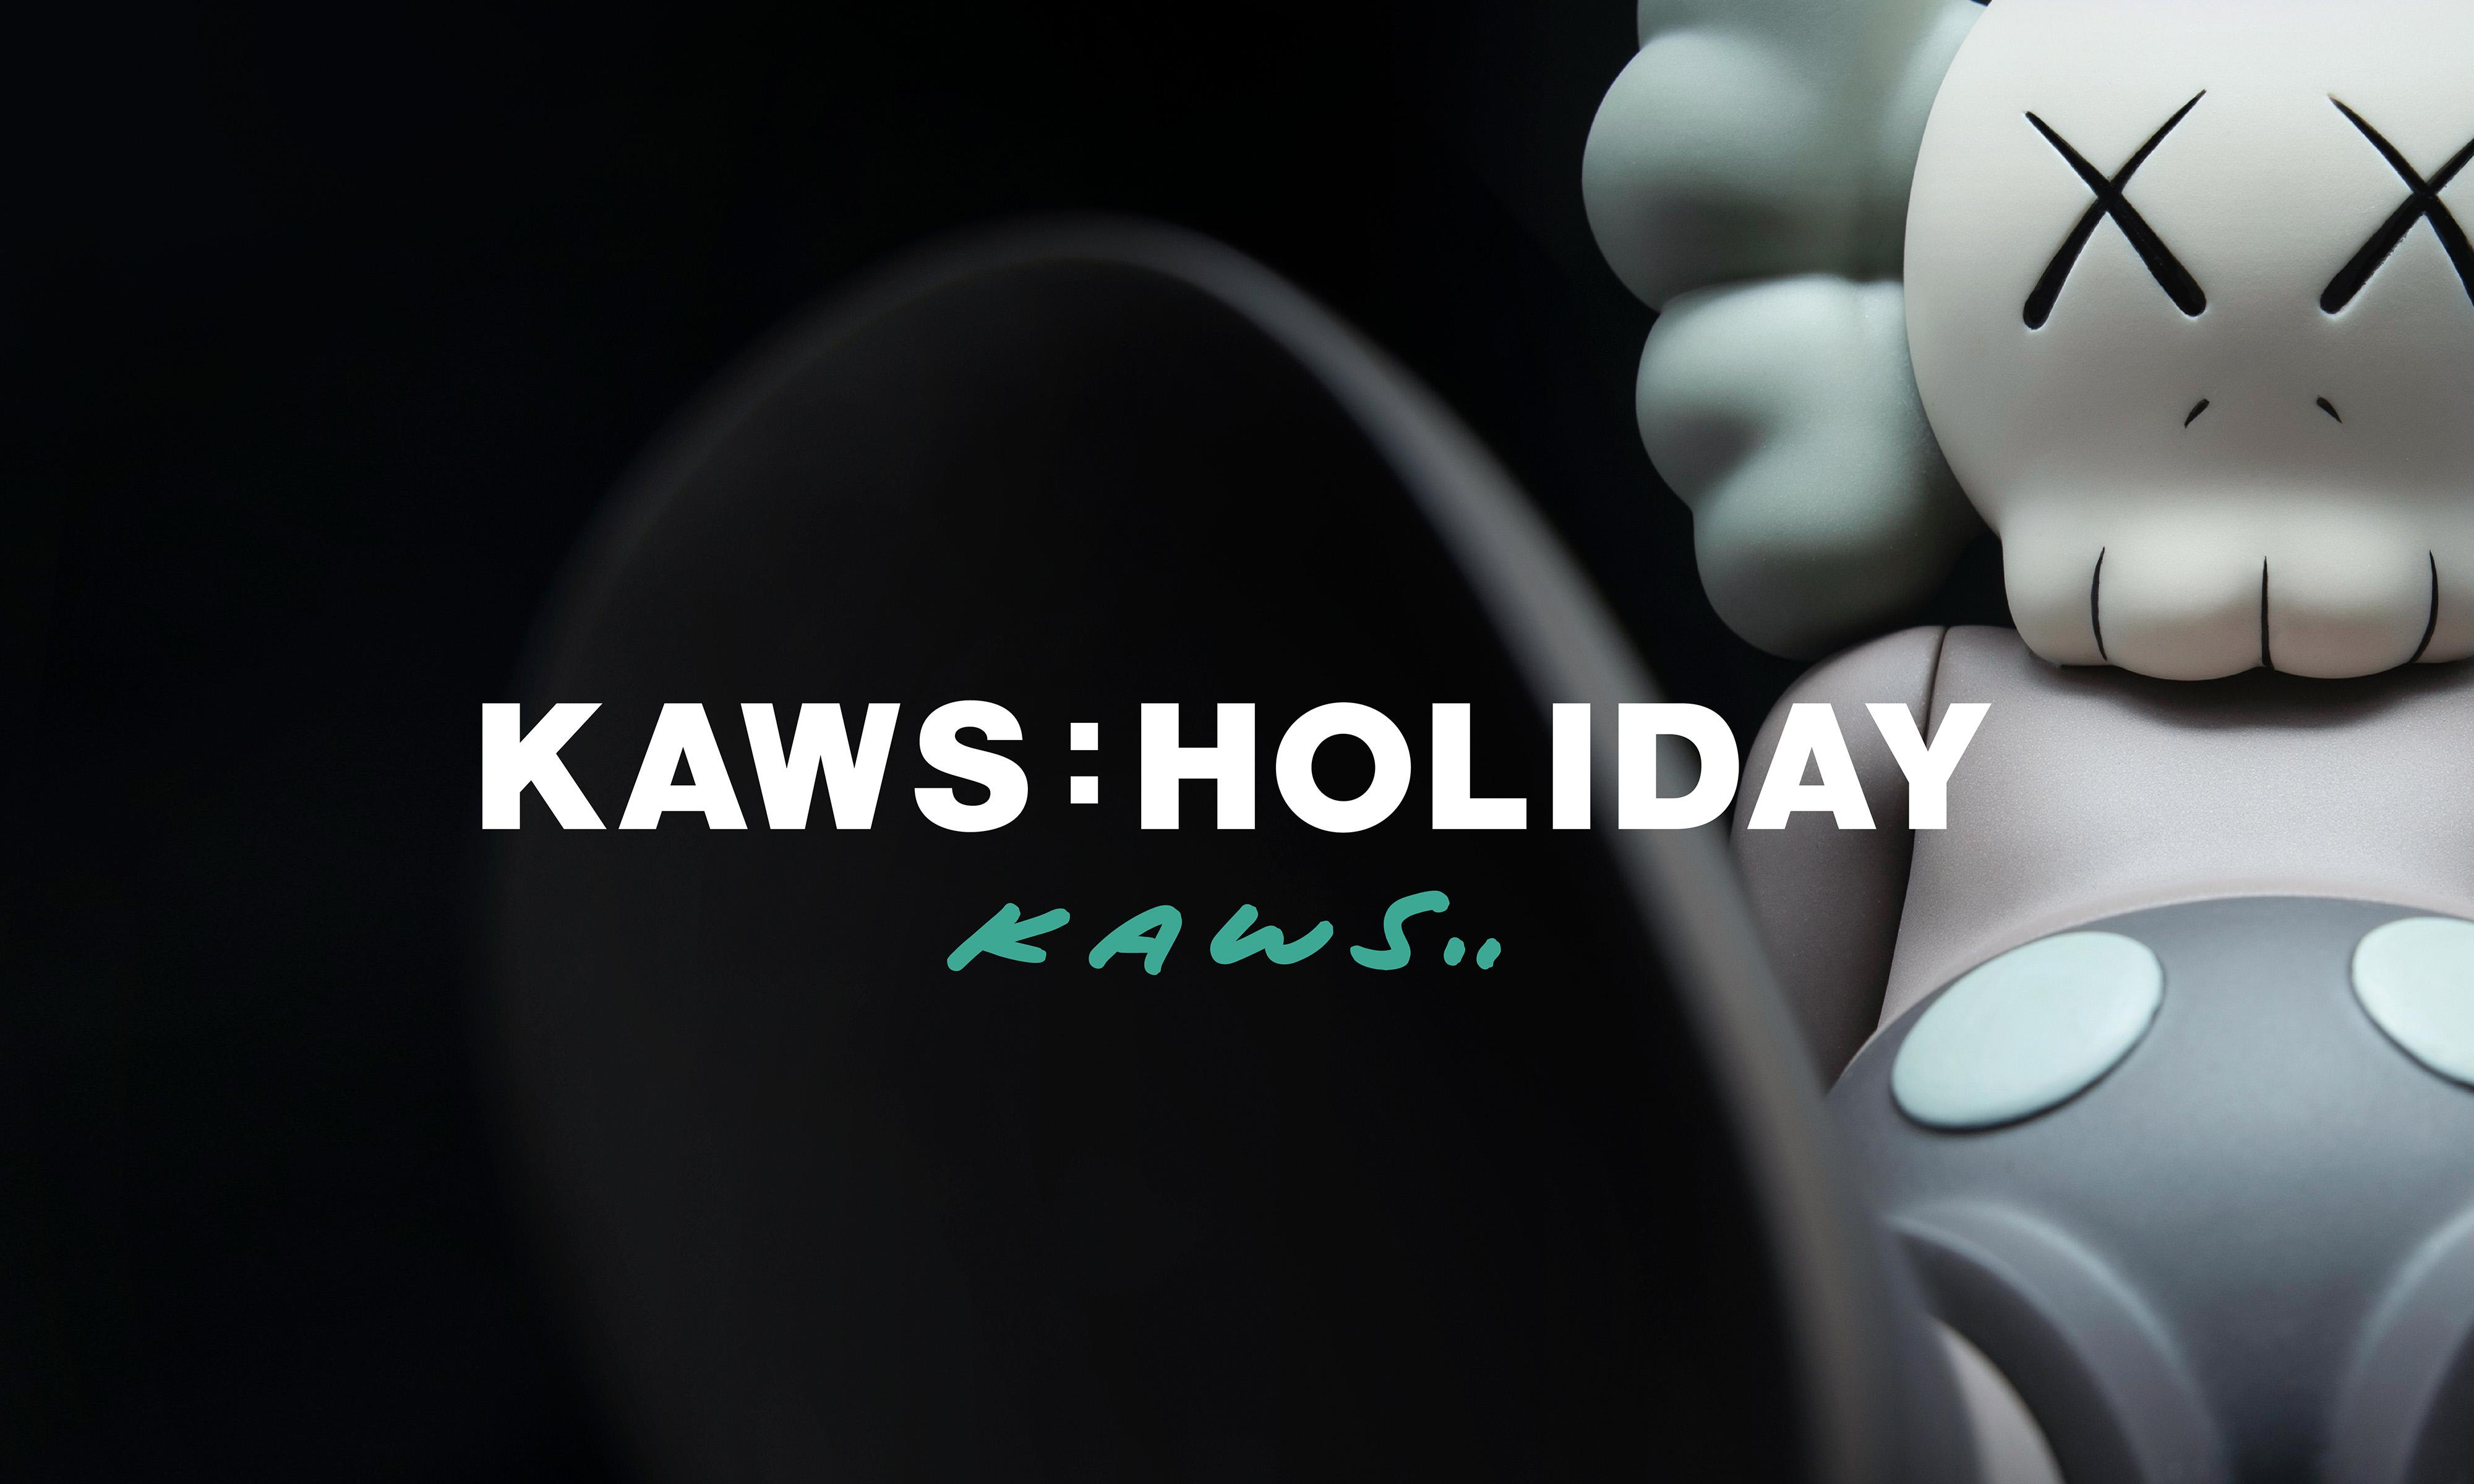 《KAWS:HOLIDAY》全新作品台北站揭开序幕,同时带来一系列限量商品